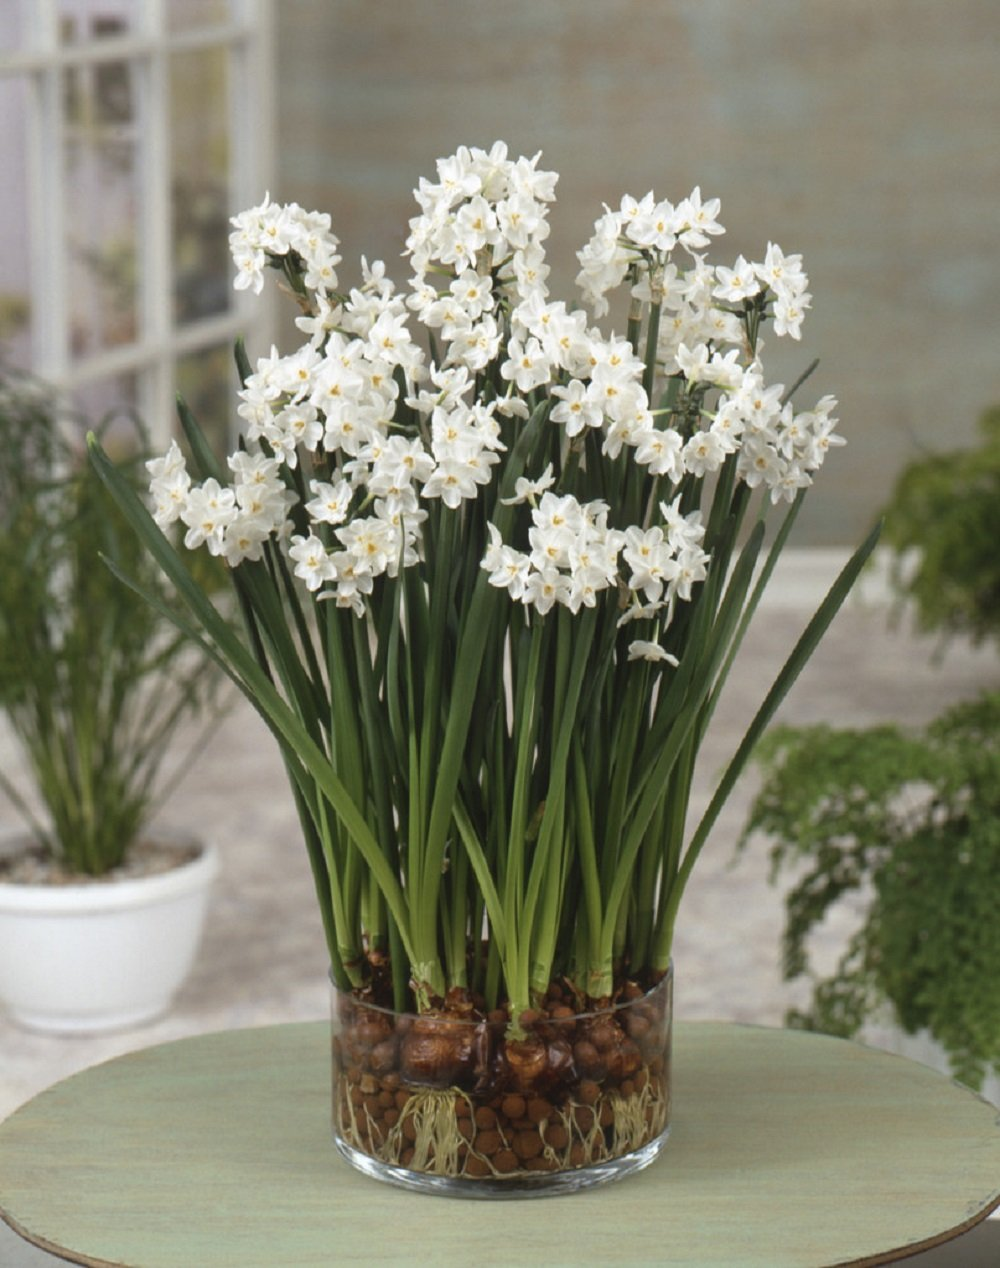 Amazon.com : 10 \'Ziva\' Paperwhites Flower Bulbs 14/15cm Bulbs ...